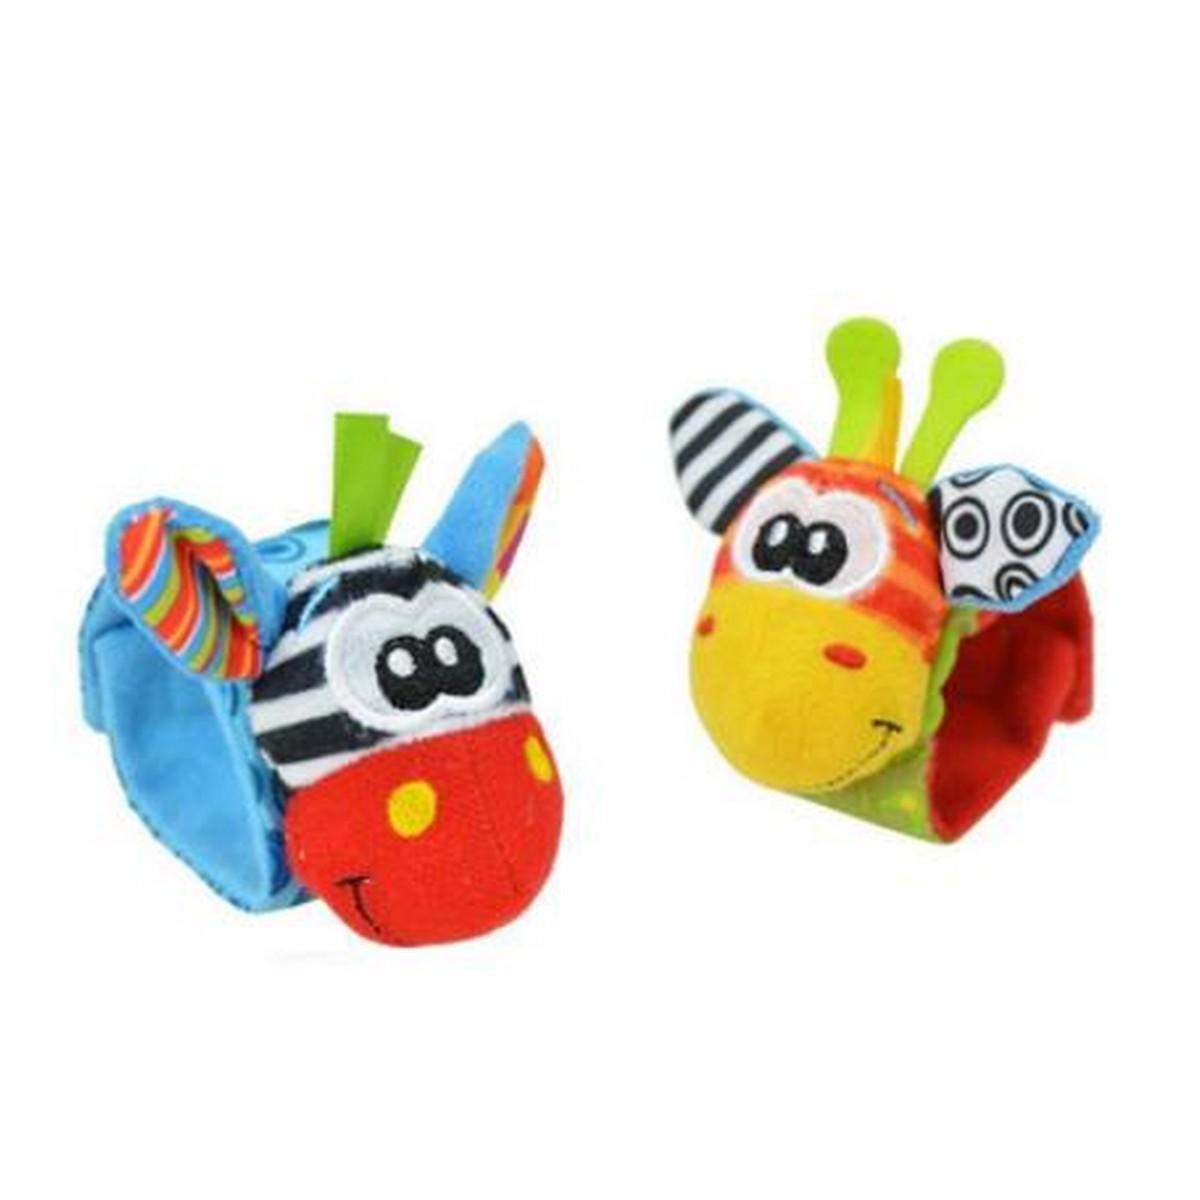 Baby Wrist Rattles Soft Plush Toy Newborn Educational Toy